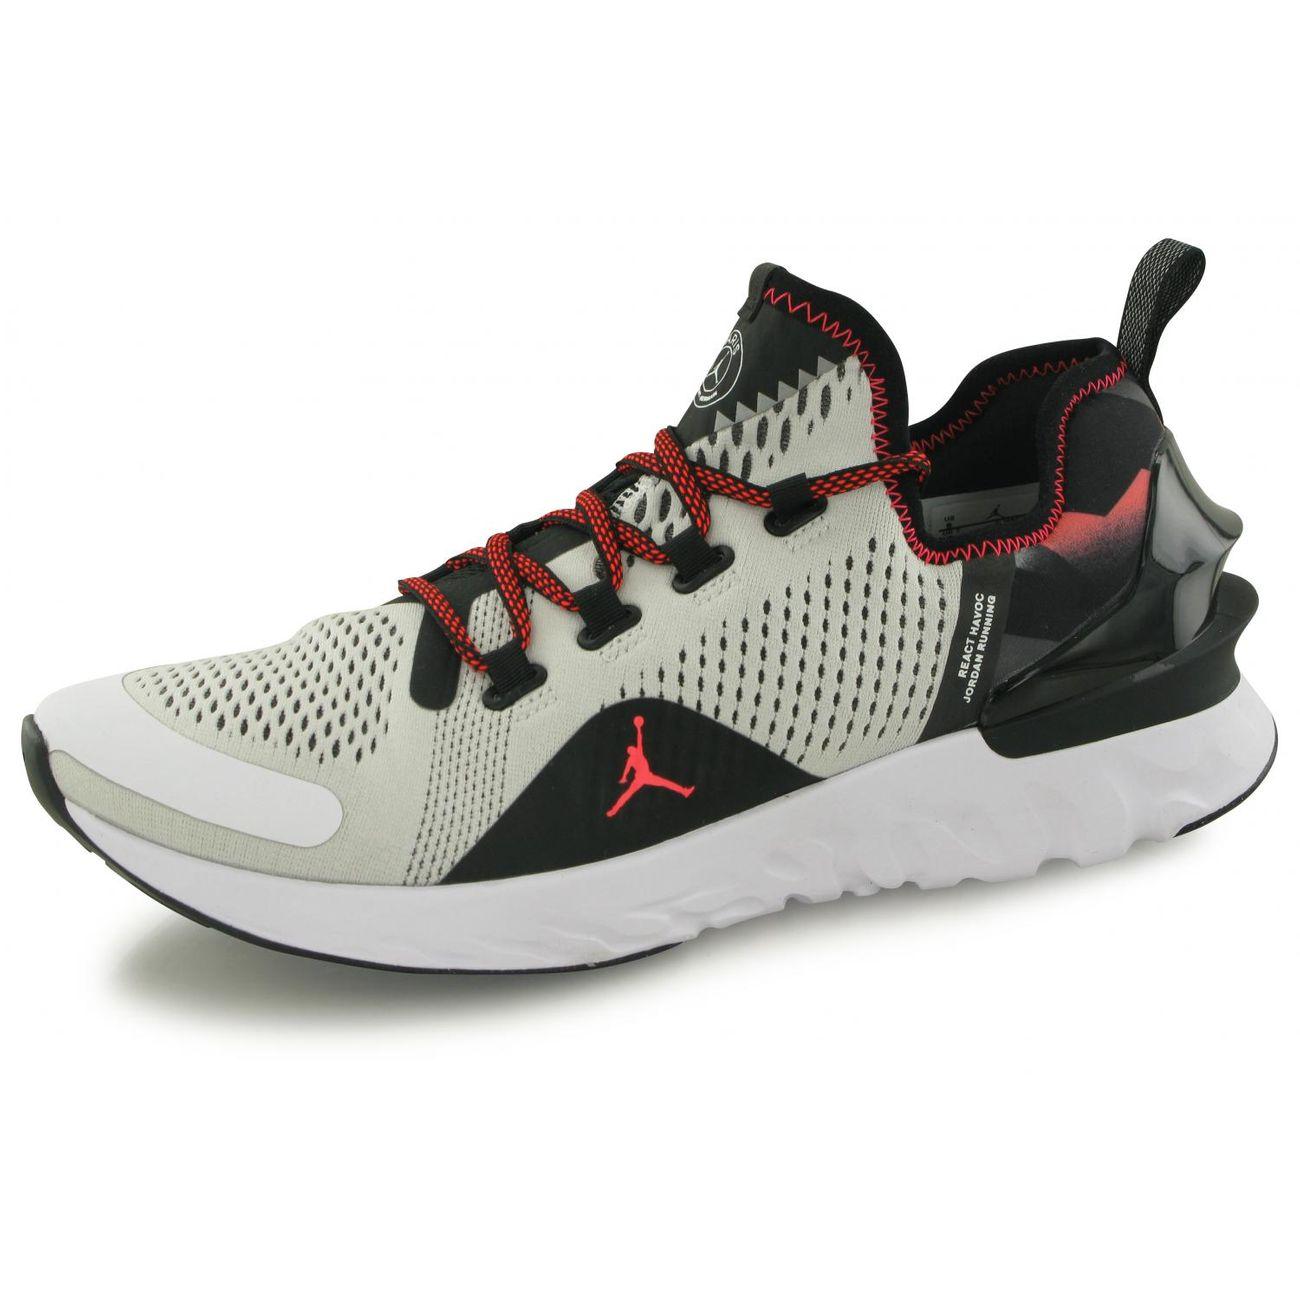 acheter populaire 8f1ce 2d1af Mode- Lifestyle homme NIKE Chaussures Jordan React Havoc Psg